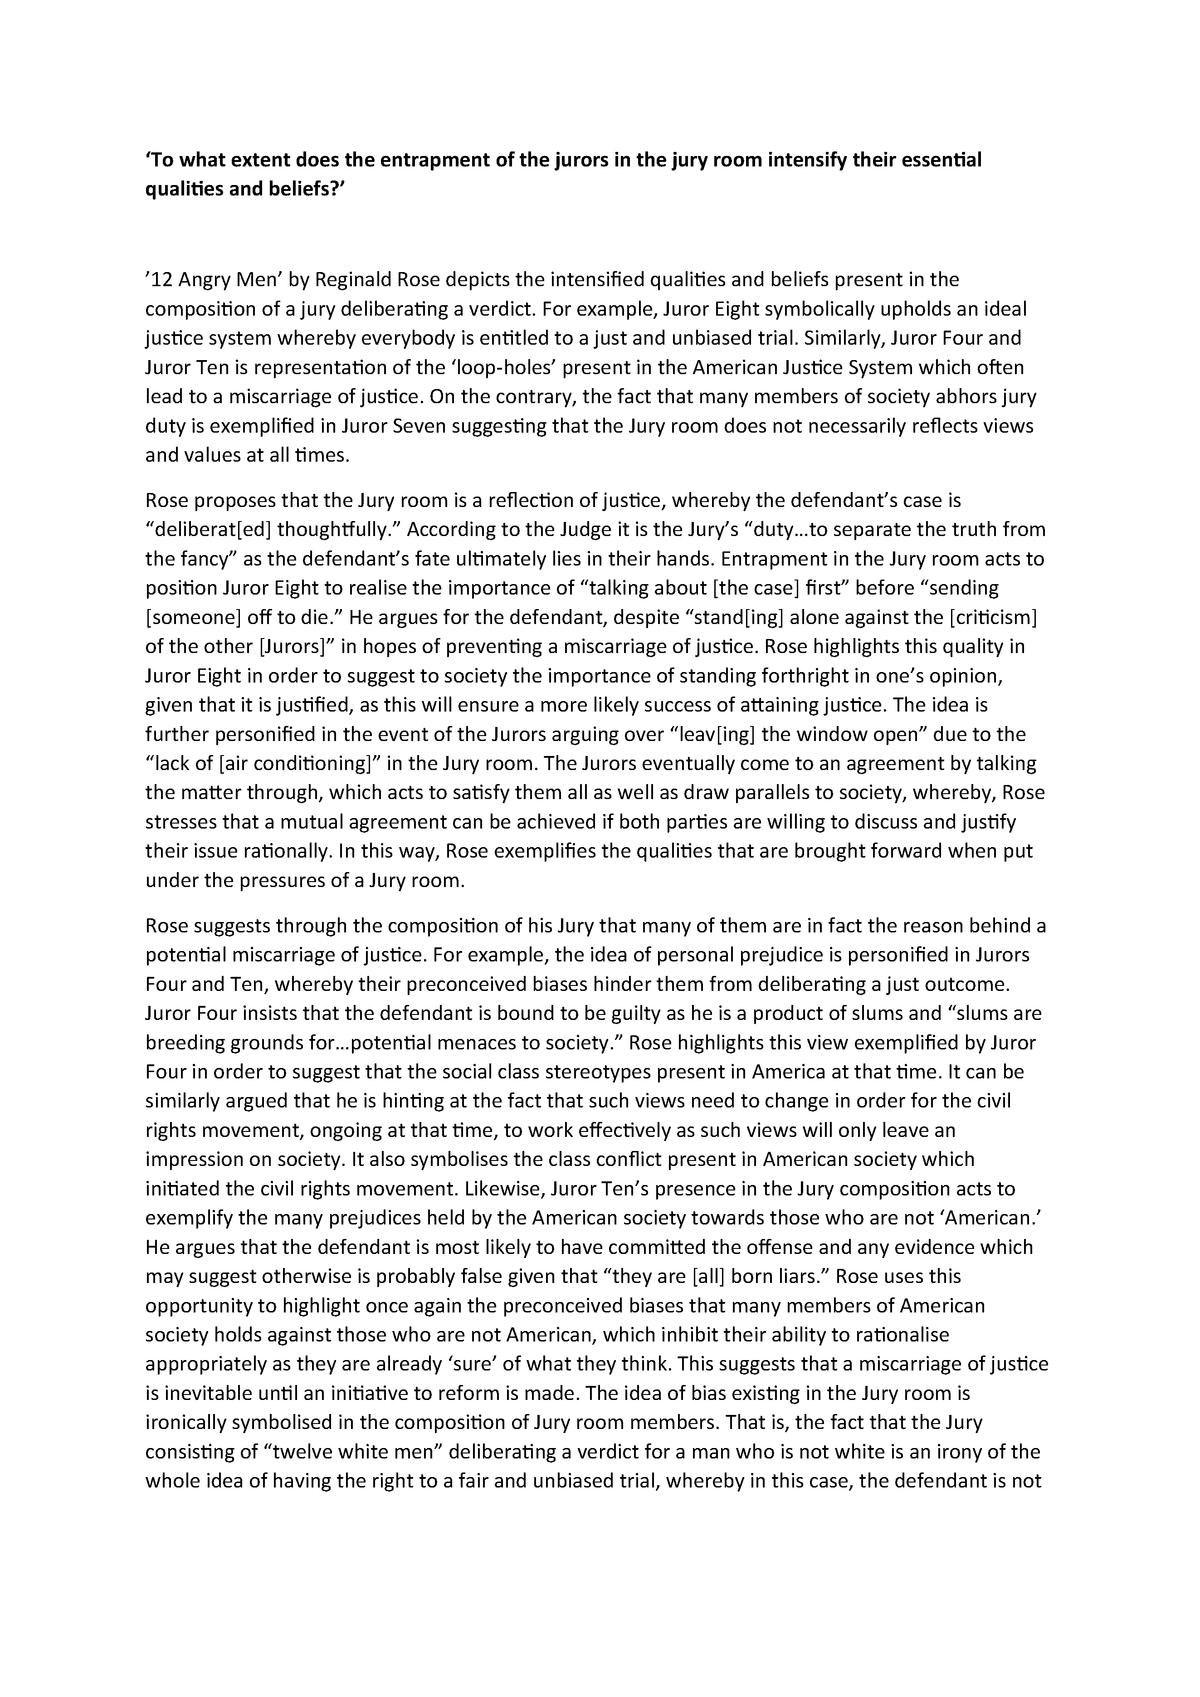 12 angry men analysis essay